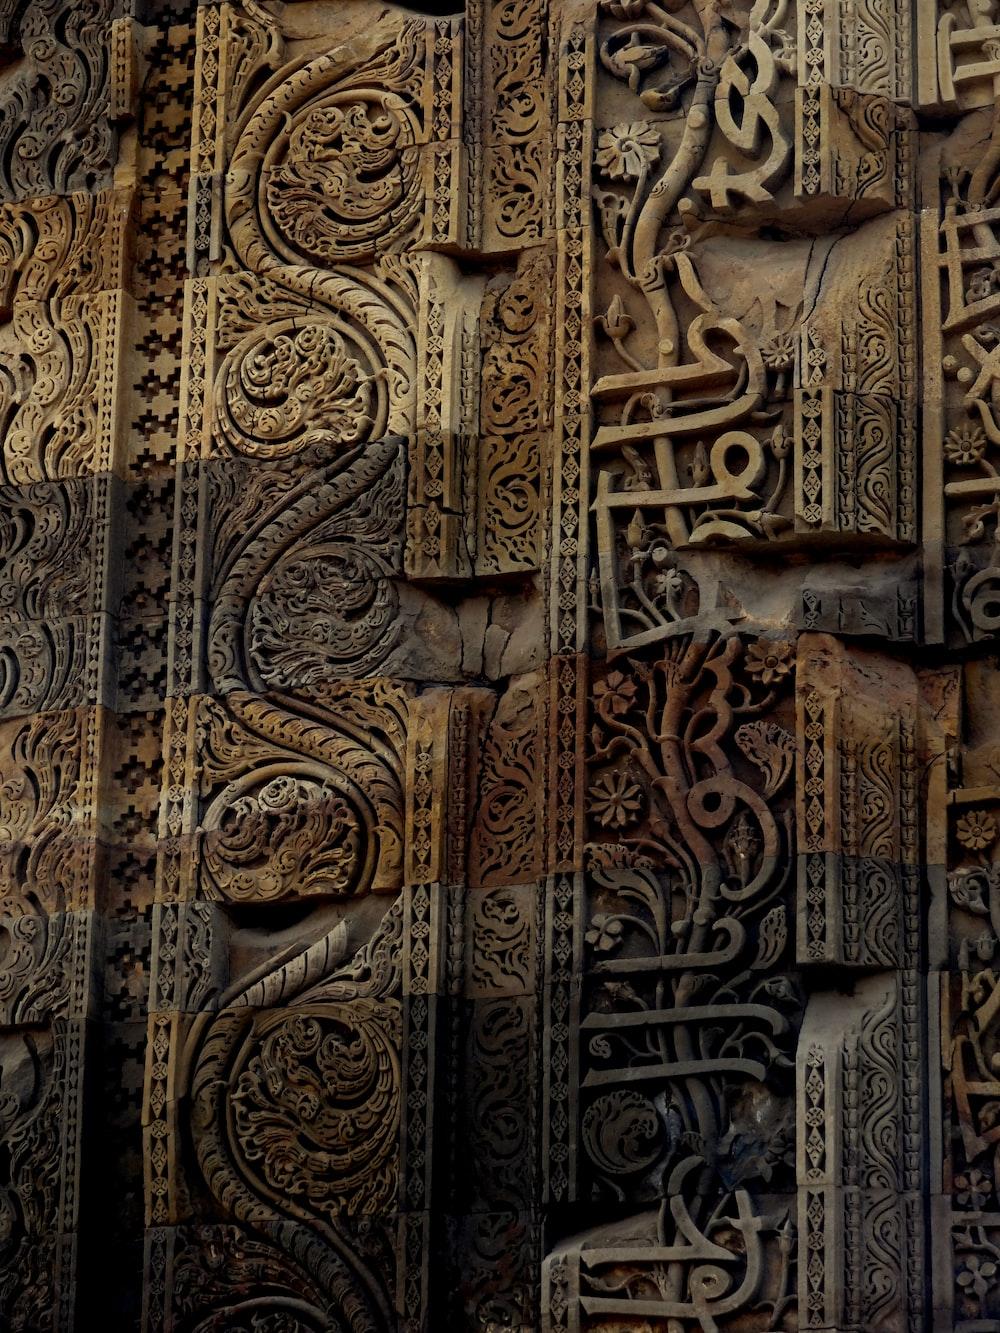 closeup photo of wooden engraved wall decor